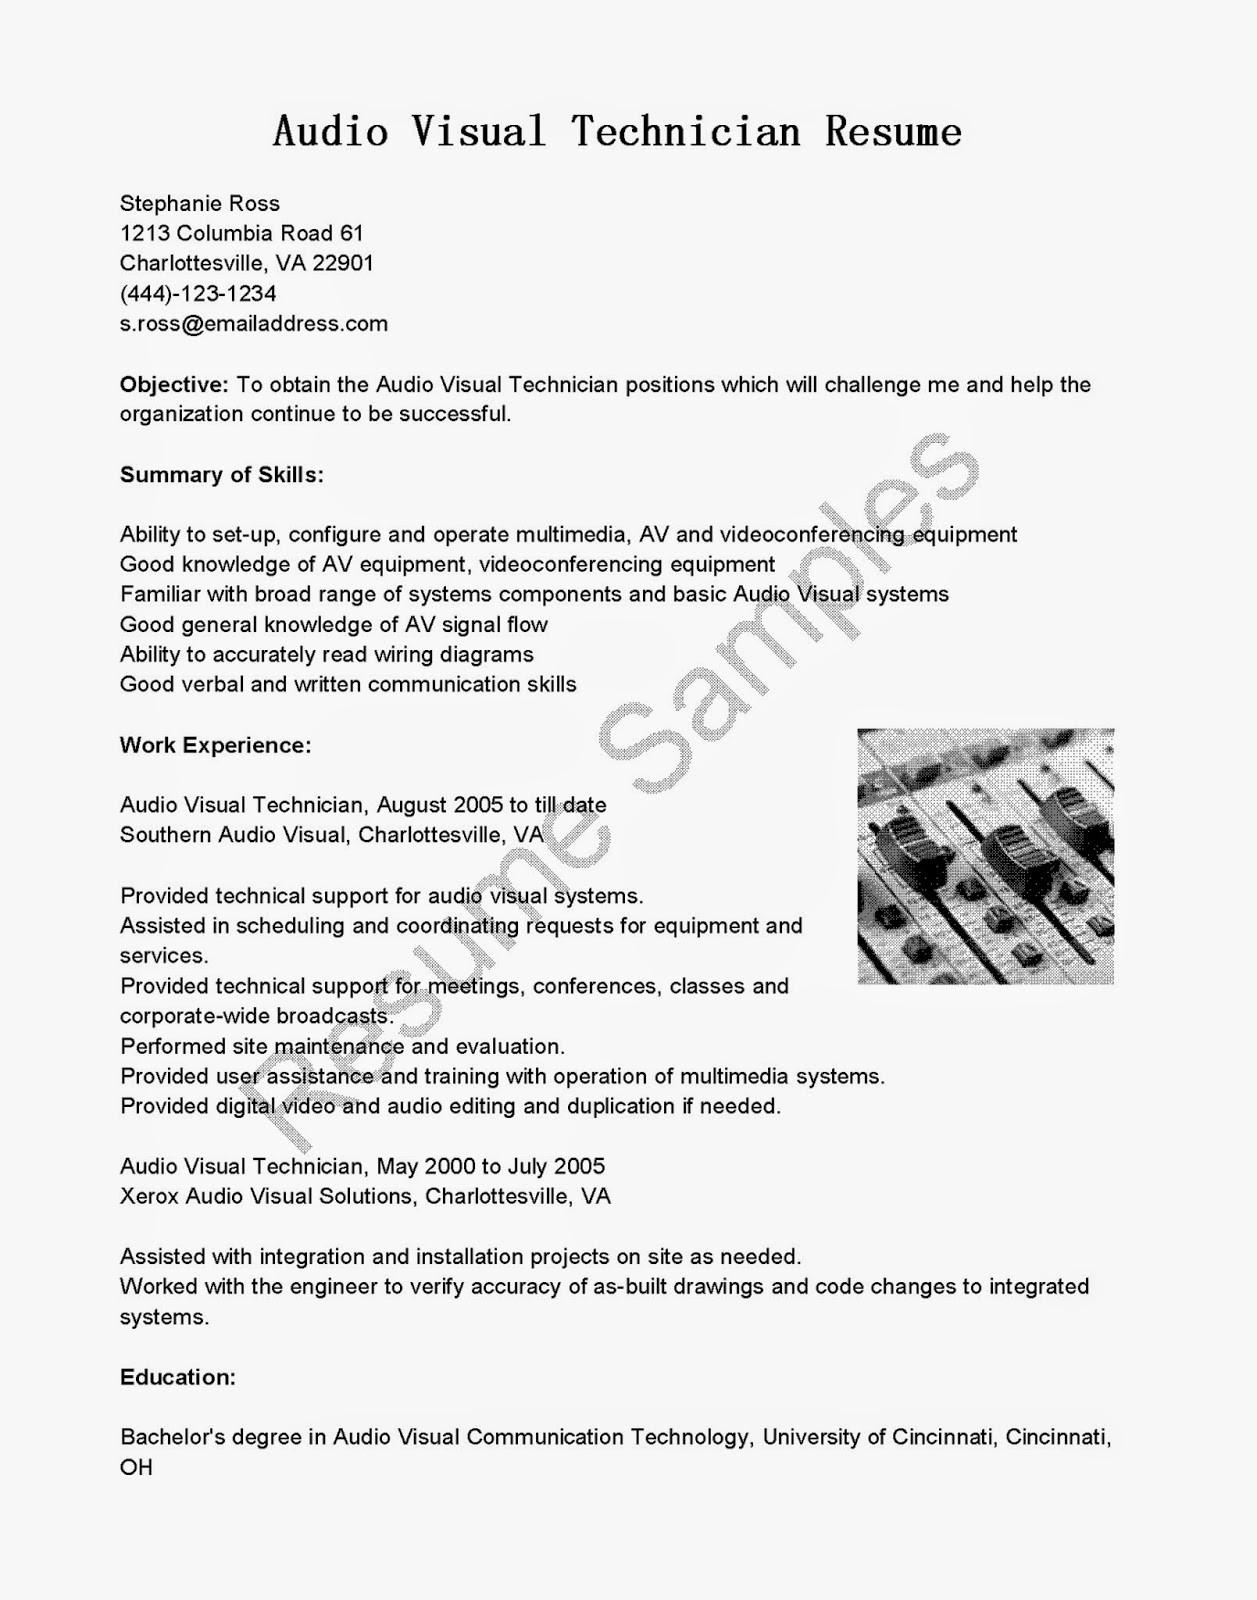 audio visual technician resume audio visual technician resume pdf audio visual technician resume sample audio visual technician resume examples audio visual technician resume objective audio video technician resume audio visual technician resume 2019 resume for audio visual technician sample resume for audio visual technician resume objective for audio visual technician